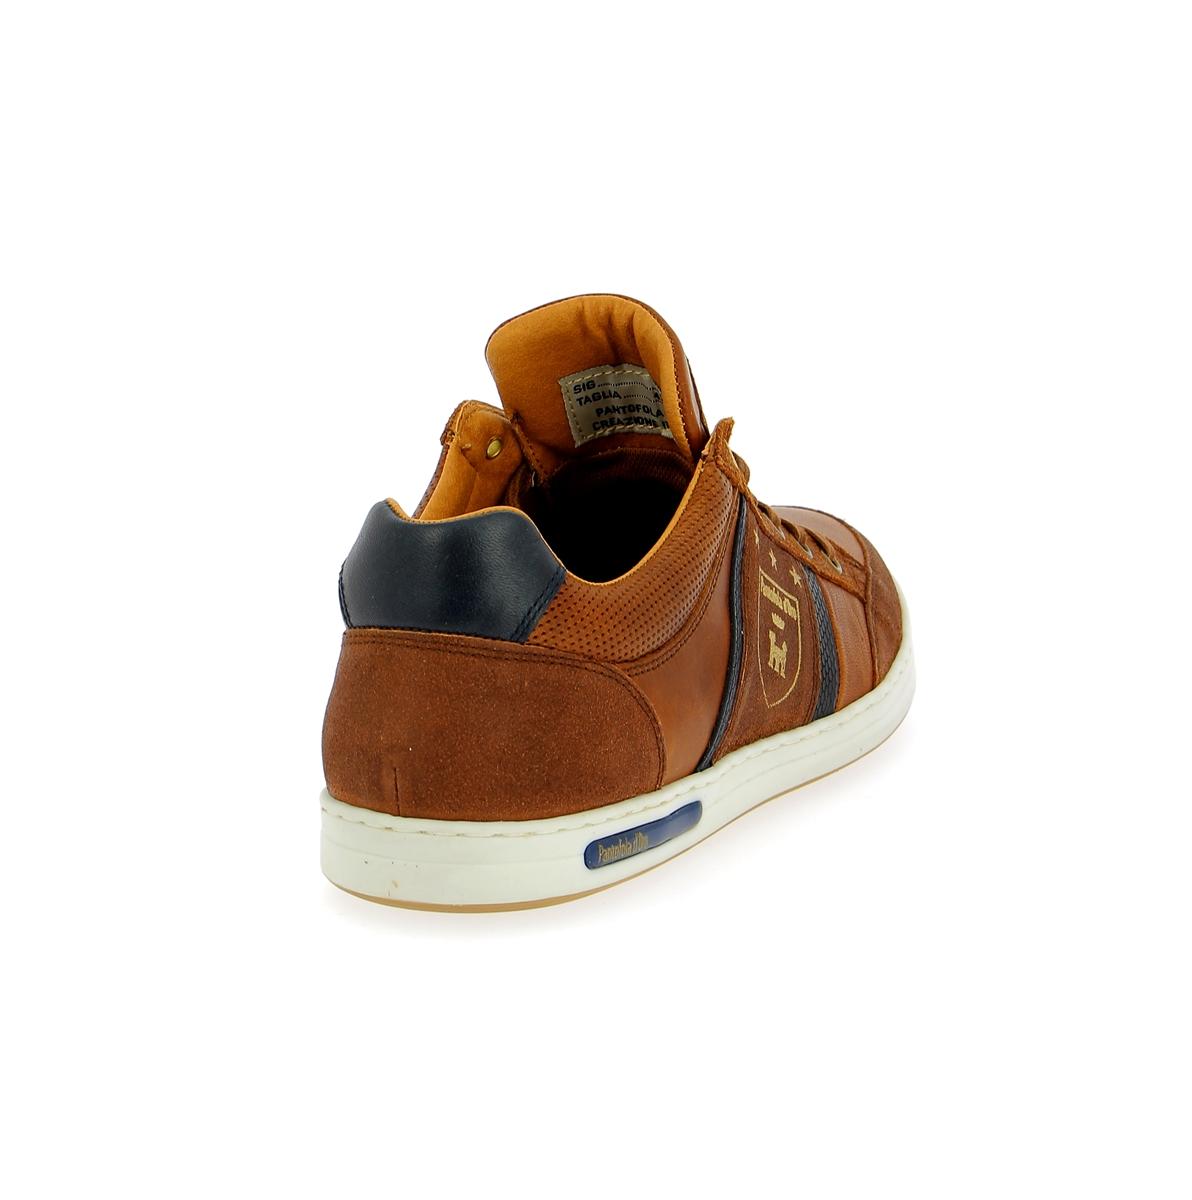 Pantofola D'oro Basket cognac